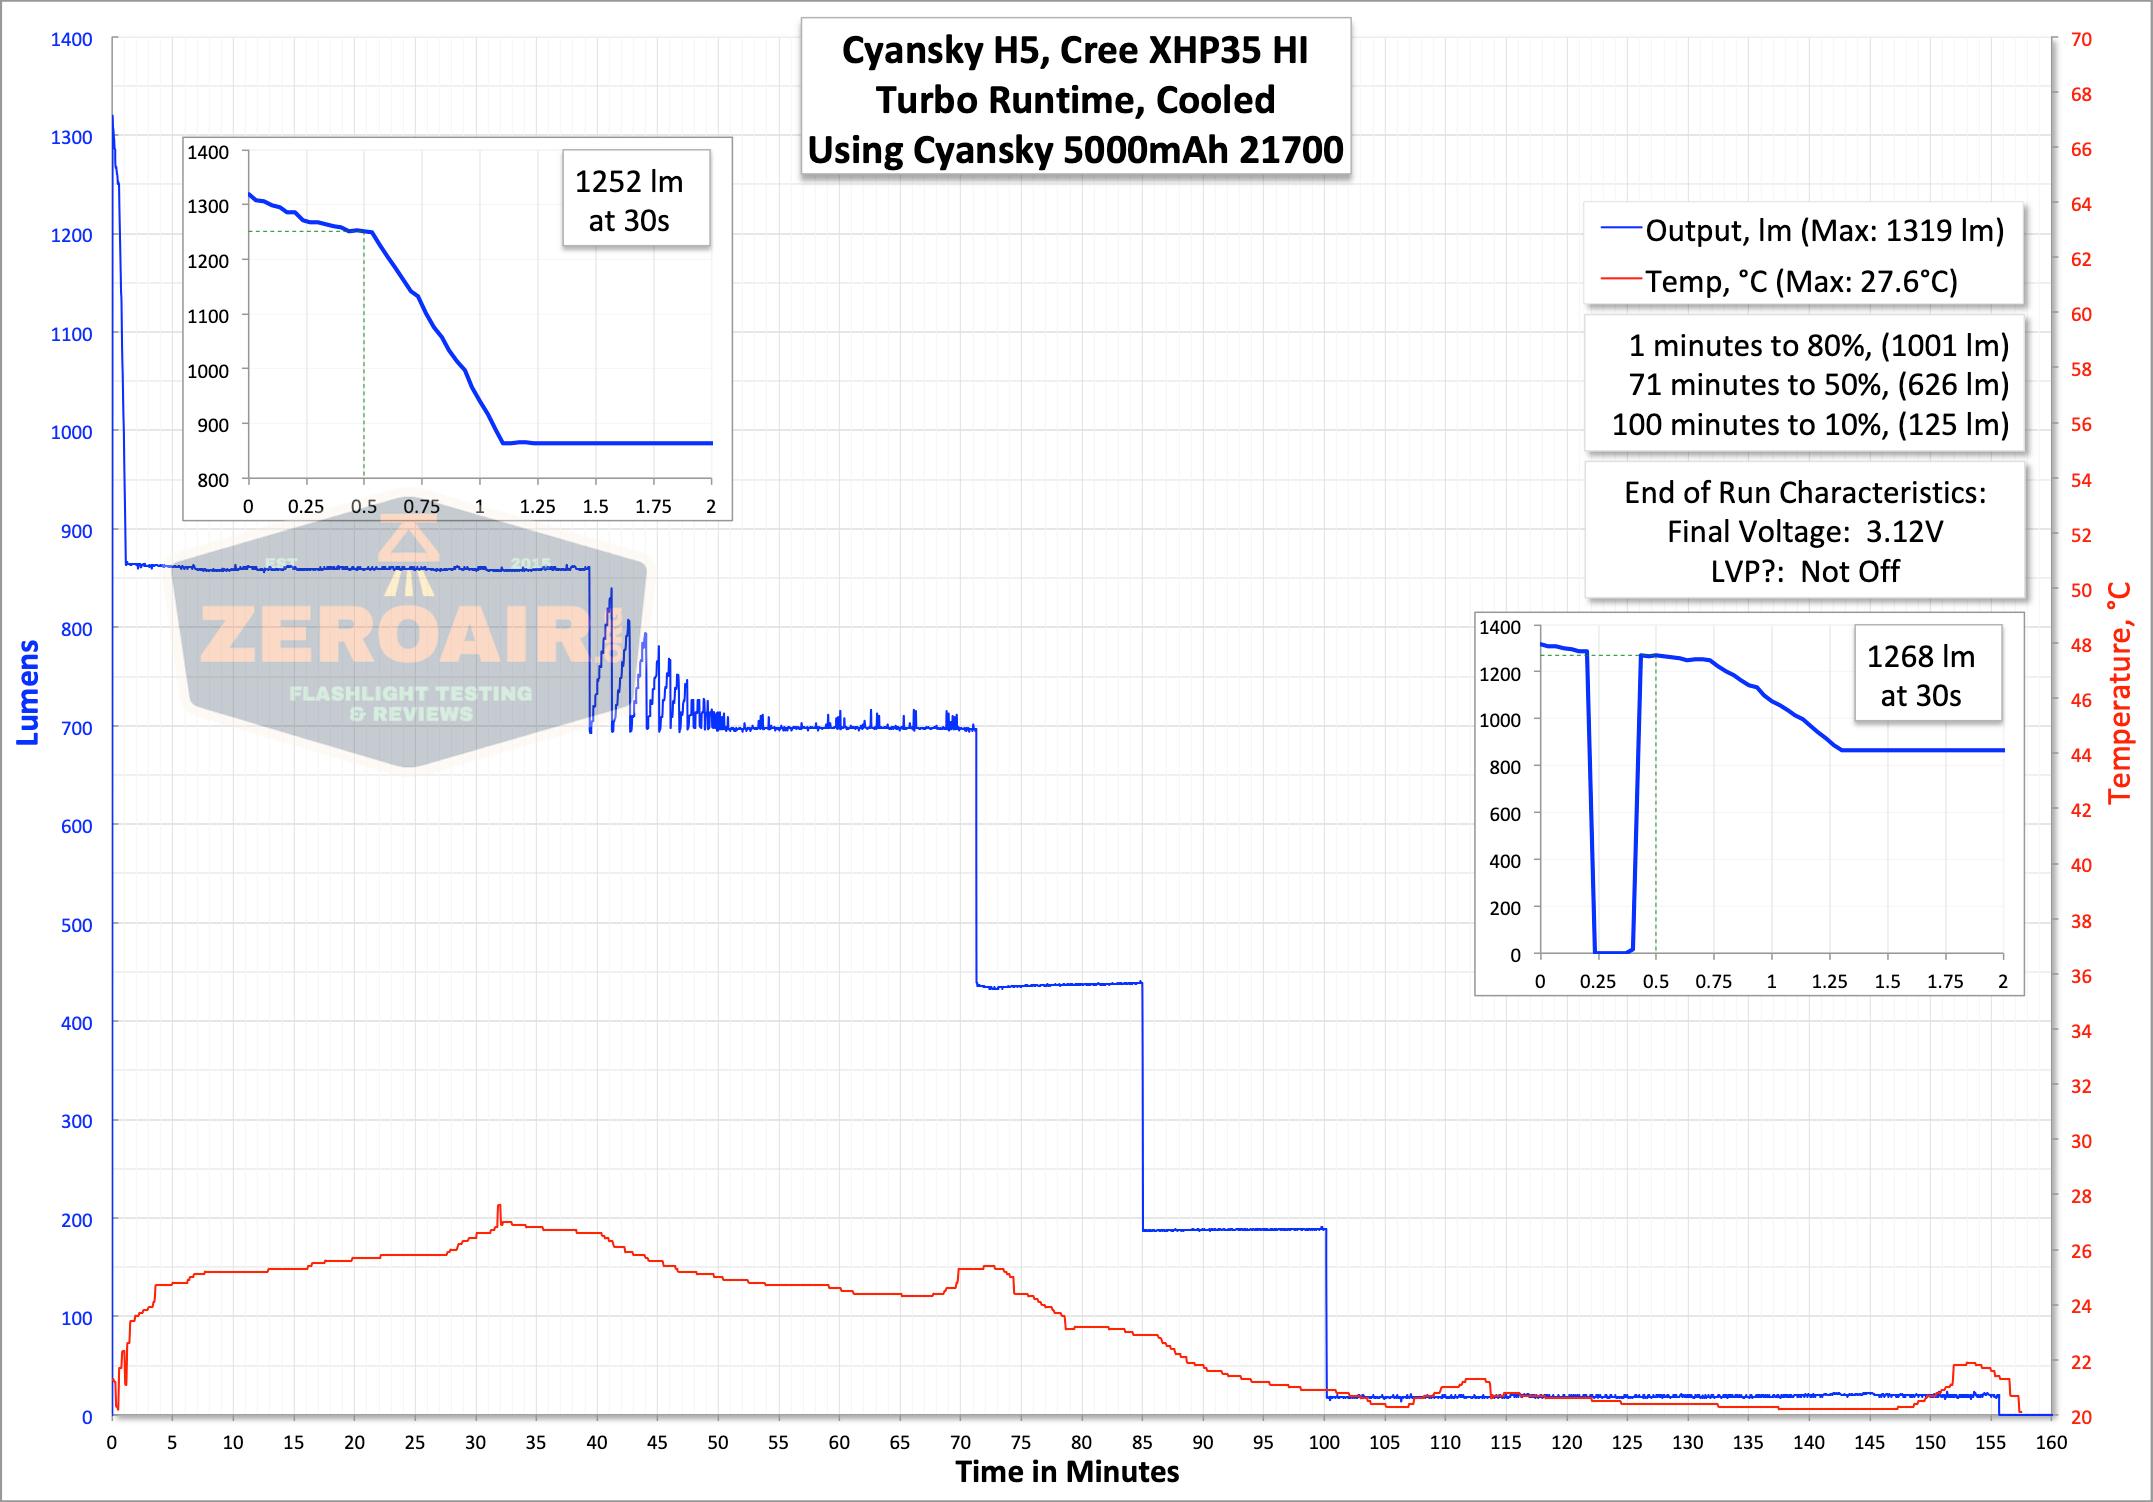 cyansky h5 runtime graph turbo